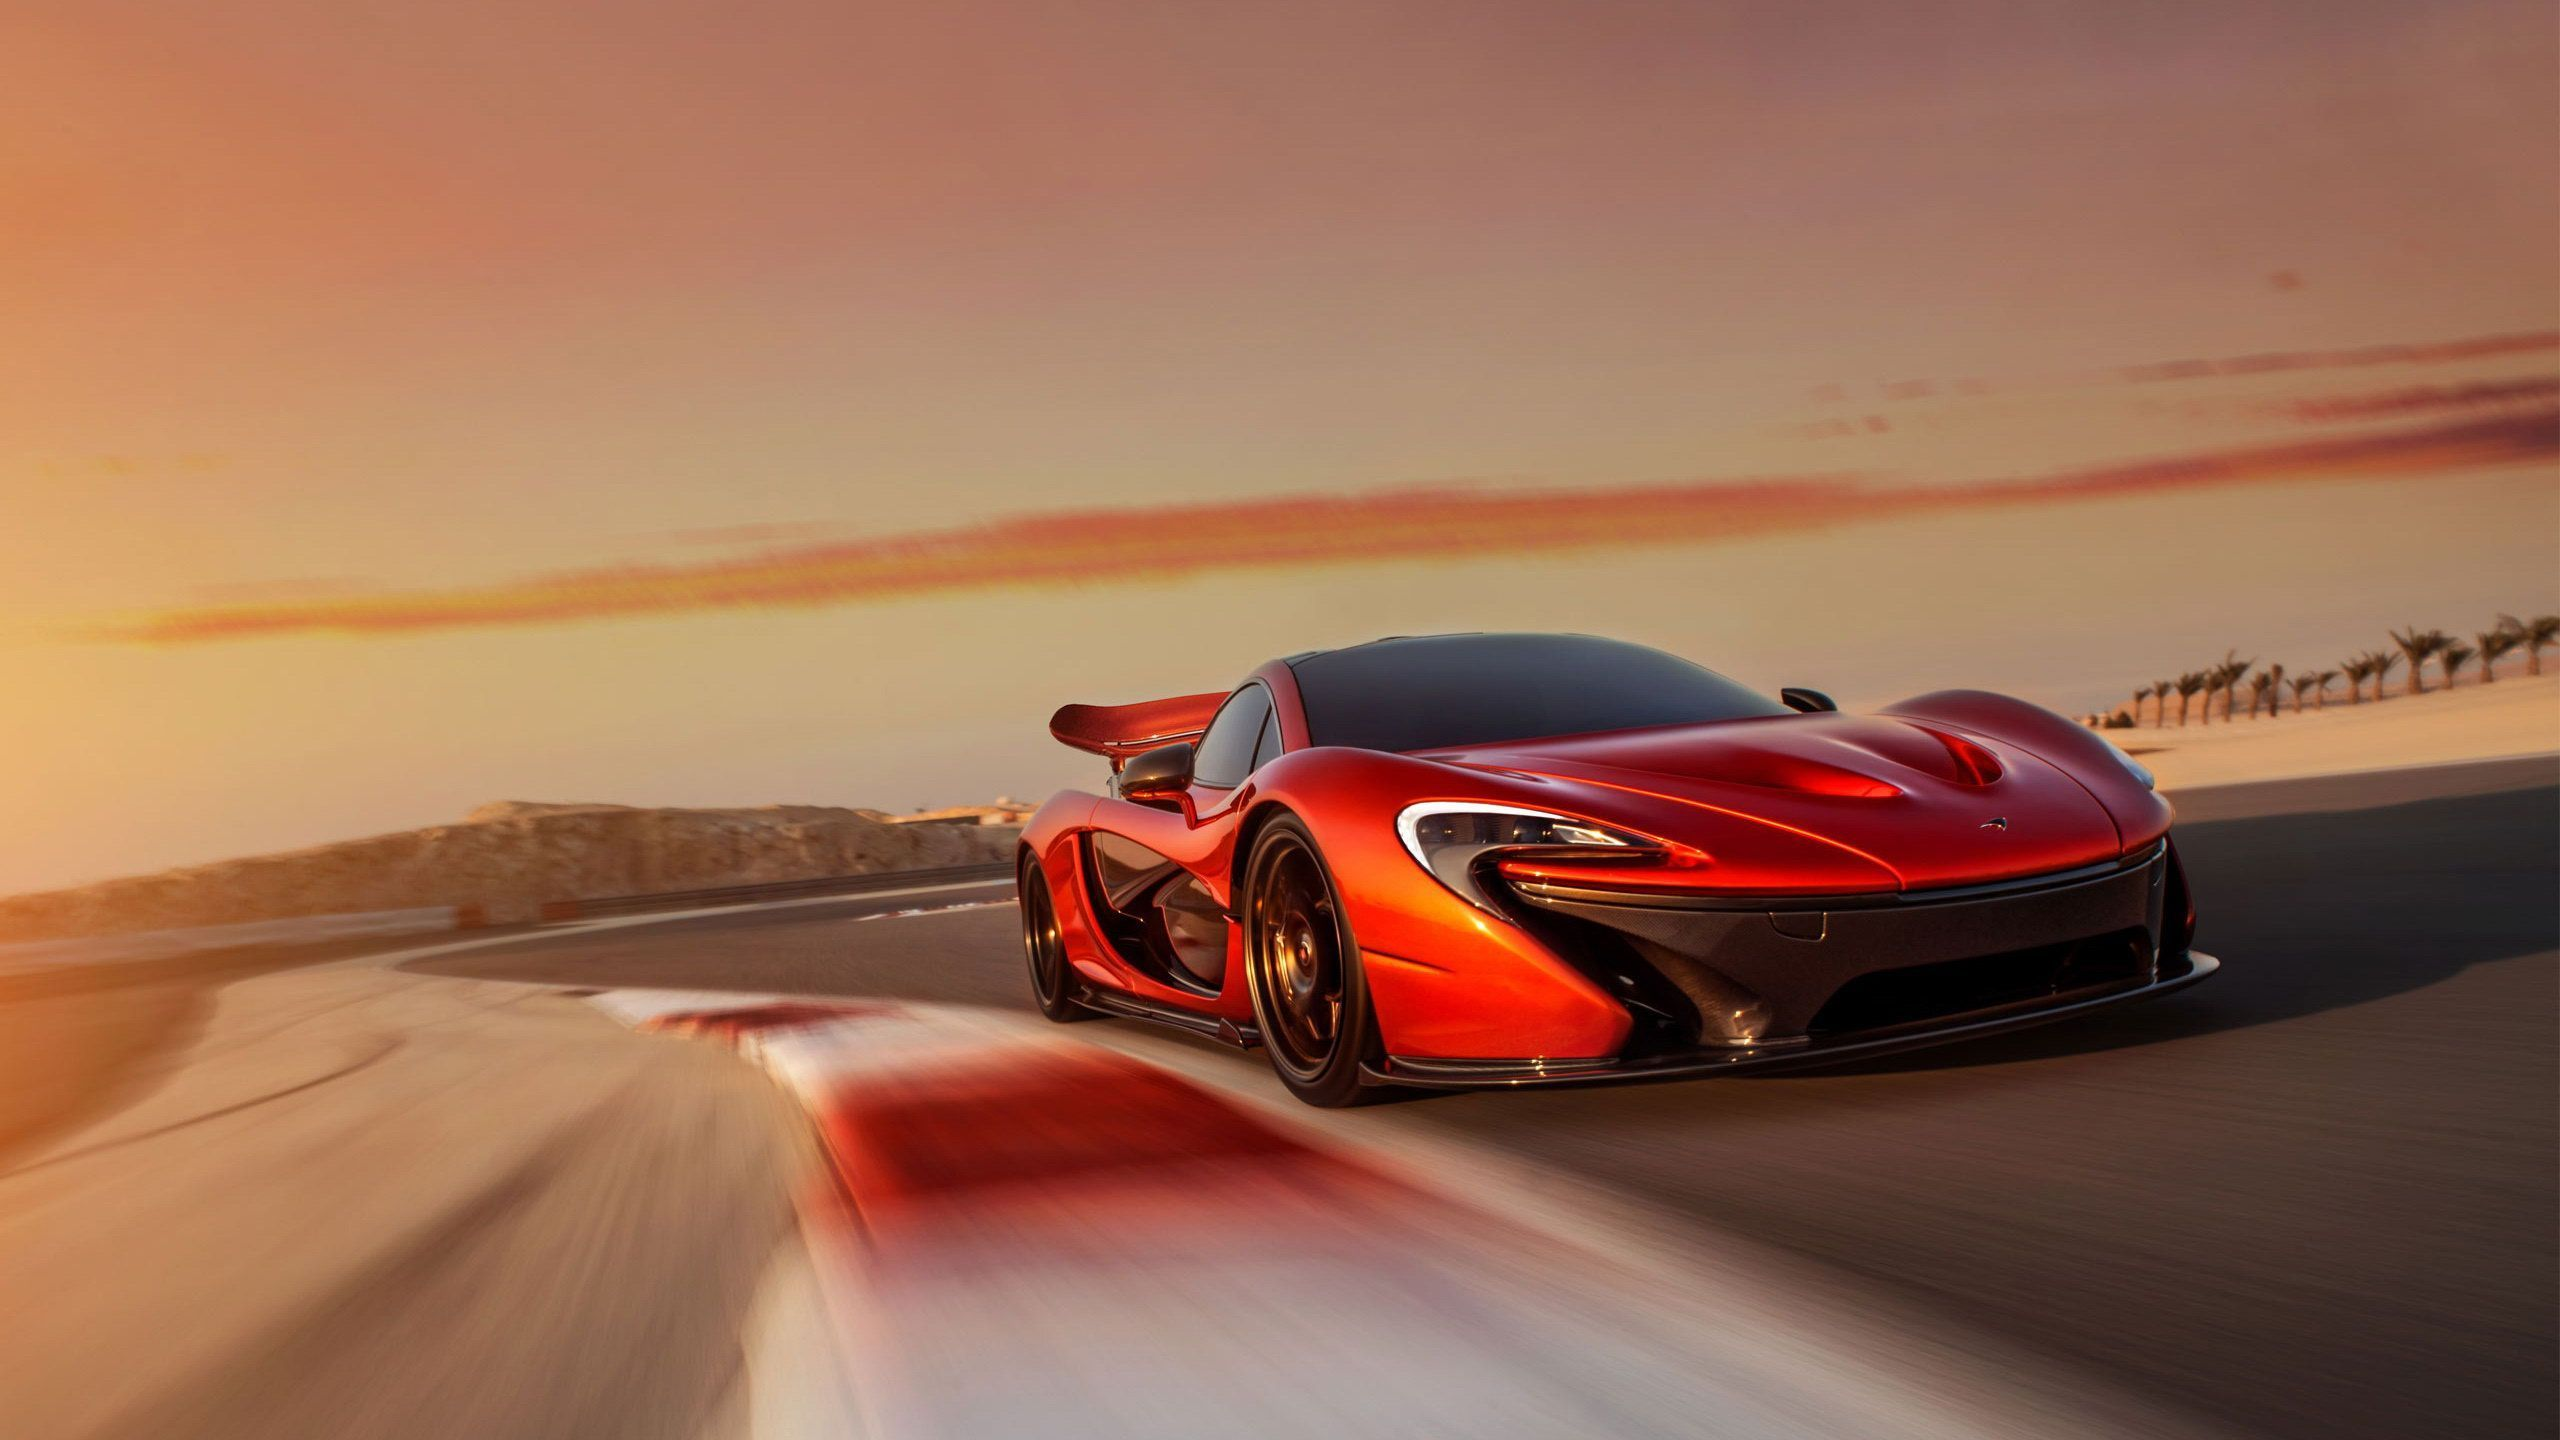 Cool Mclaren P Concept Sports Car Wallpapers